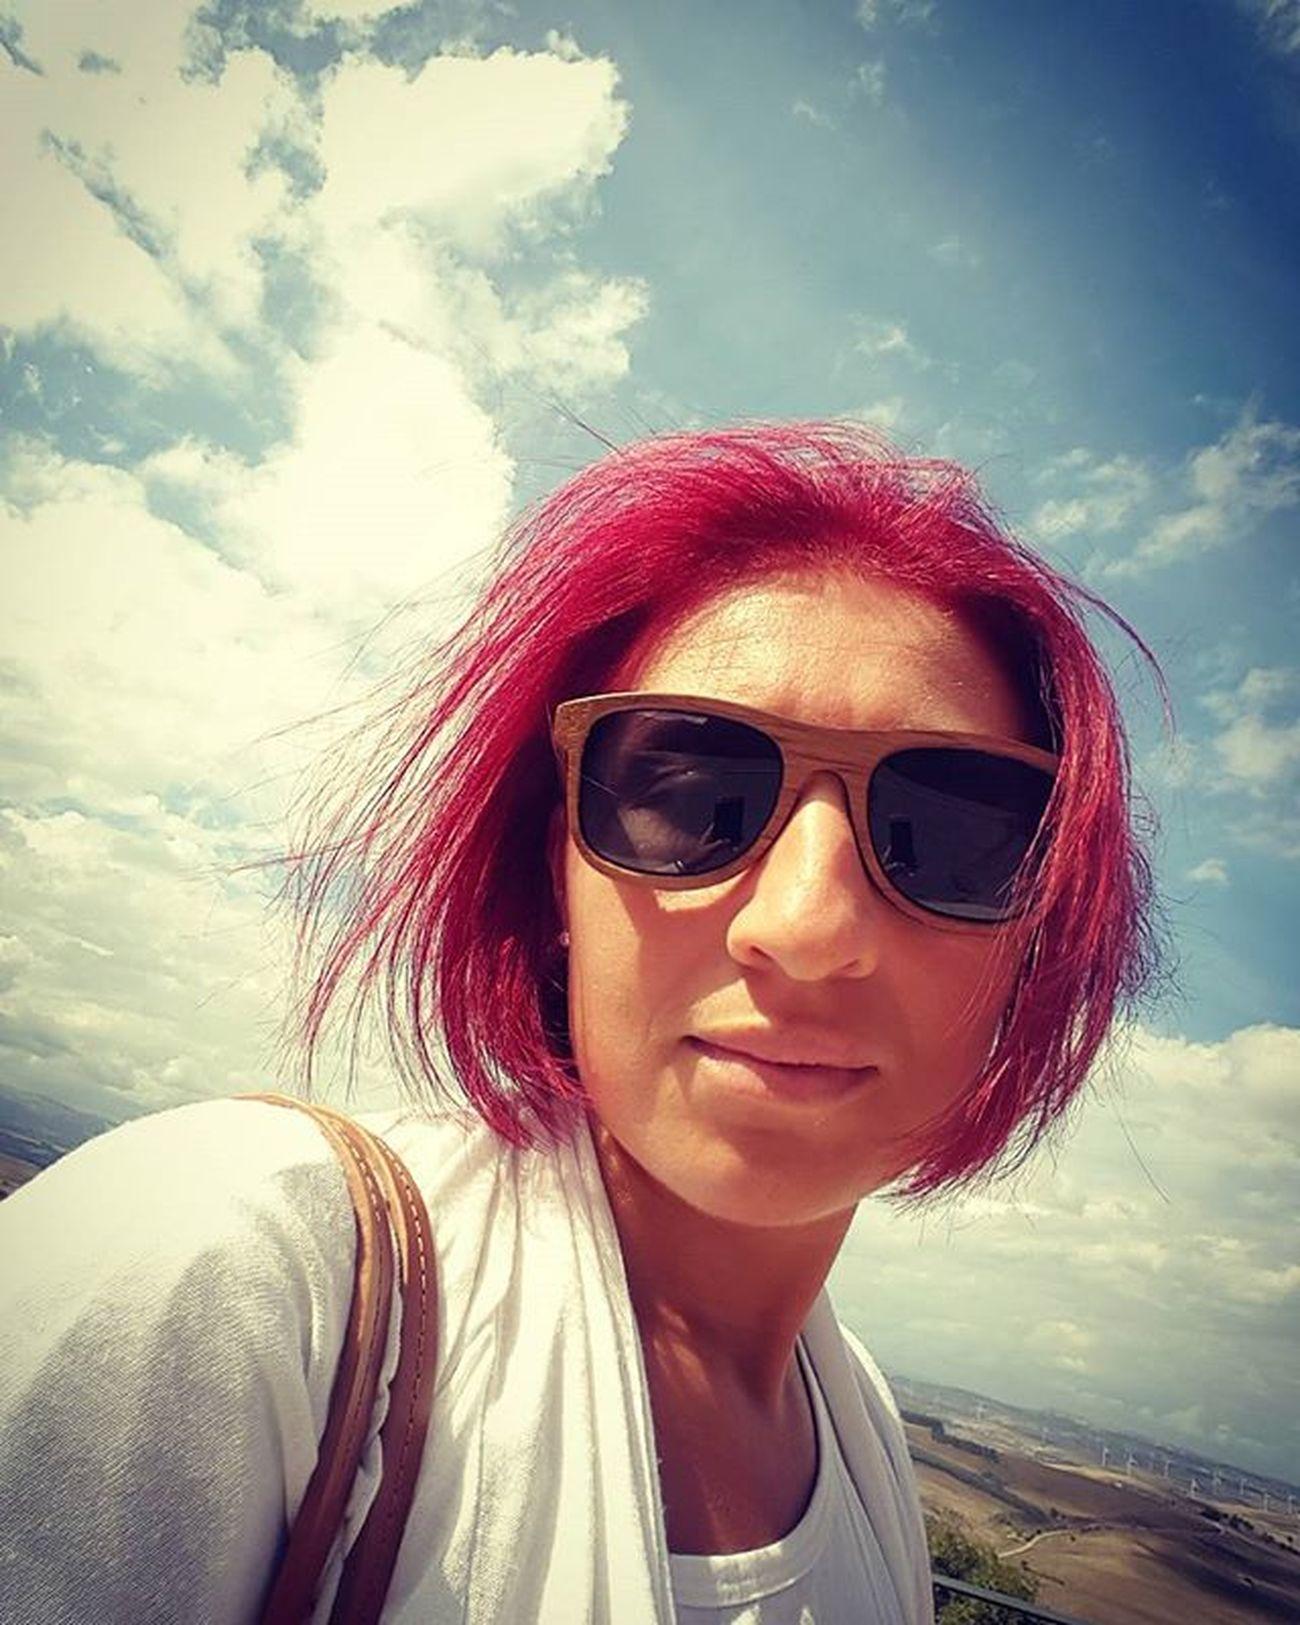 Sunday aperitivo.. Puglia Italia Italy Southernitaly Selfiesunday Selfietime Selfie Lorealmajirouge Lorealmajicontrast Majicontrastmagenta Majirouge666 Wellakoleston Koleston065 Wellahair Loreal Wellaspecialmix Wellaspecialmix065 Wellaspecialmixpink Wellakolestonpink Haircolor Haircolour Selfie ✌ Selfies Red Hair RedHAIR ❤